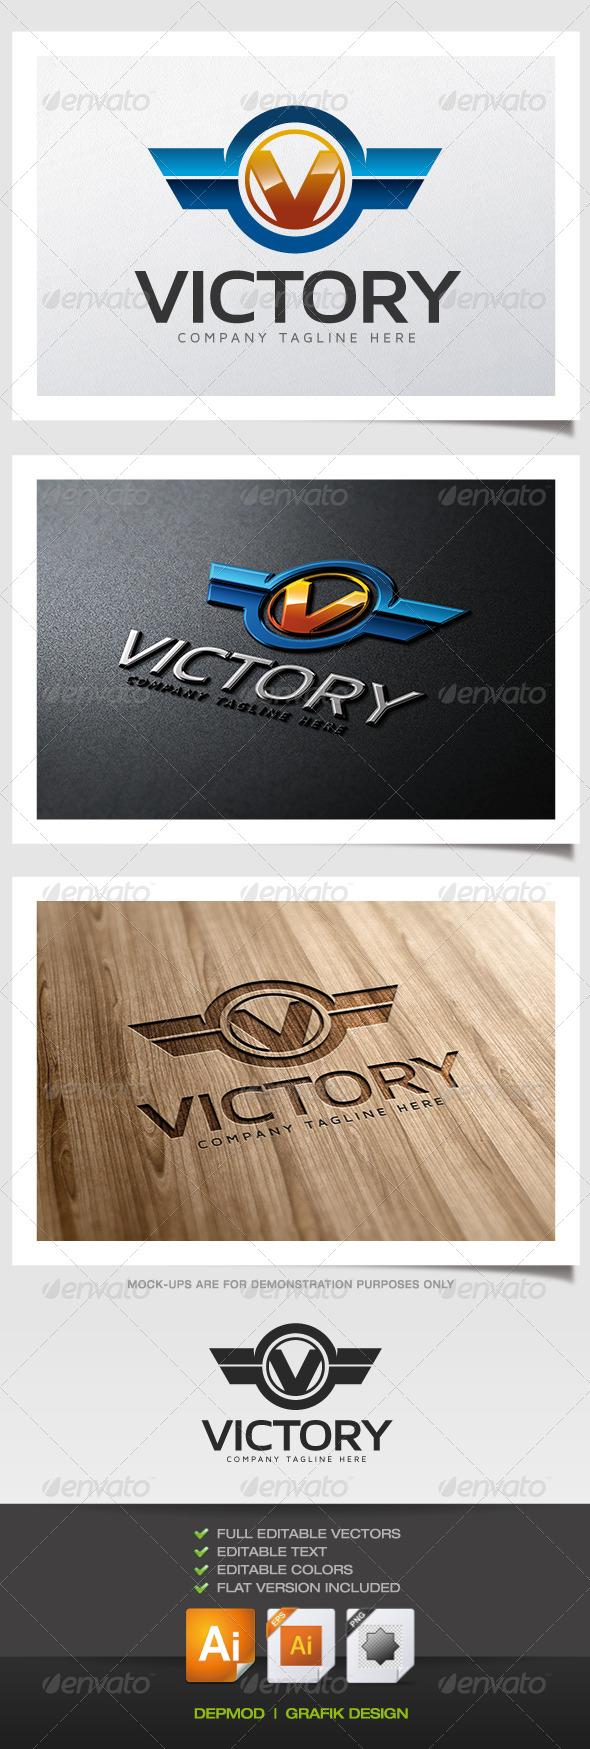 GraphicRiver Victory Logo 5560556